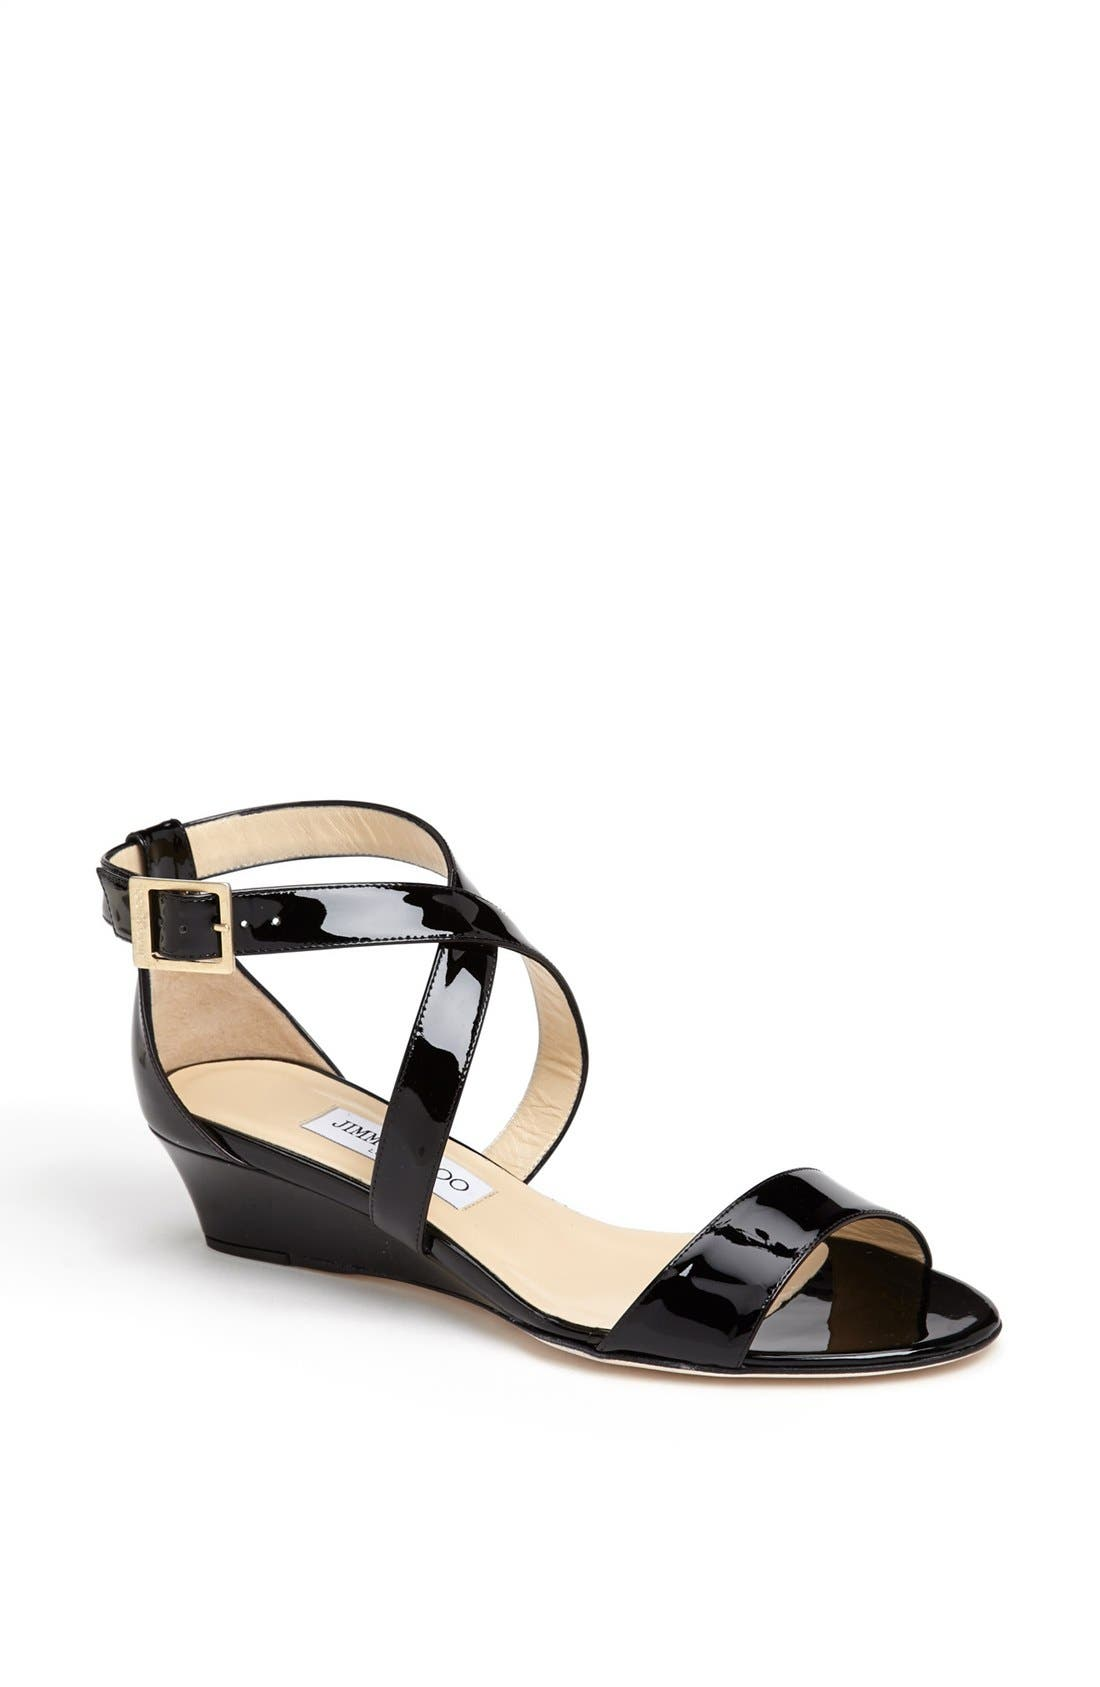 Main Image - Jimmy Choo 'Chiara' Strap Wedge Sandal (Women)